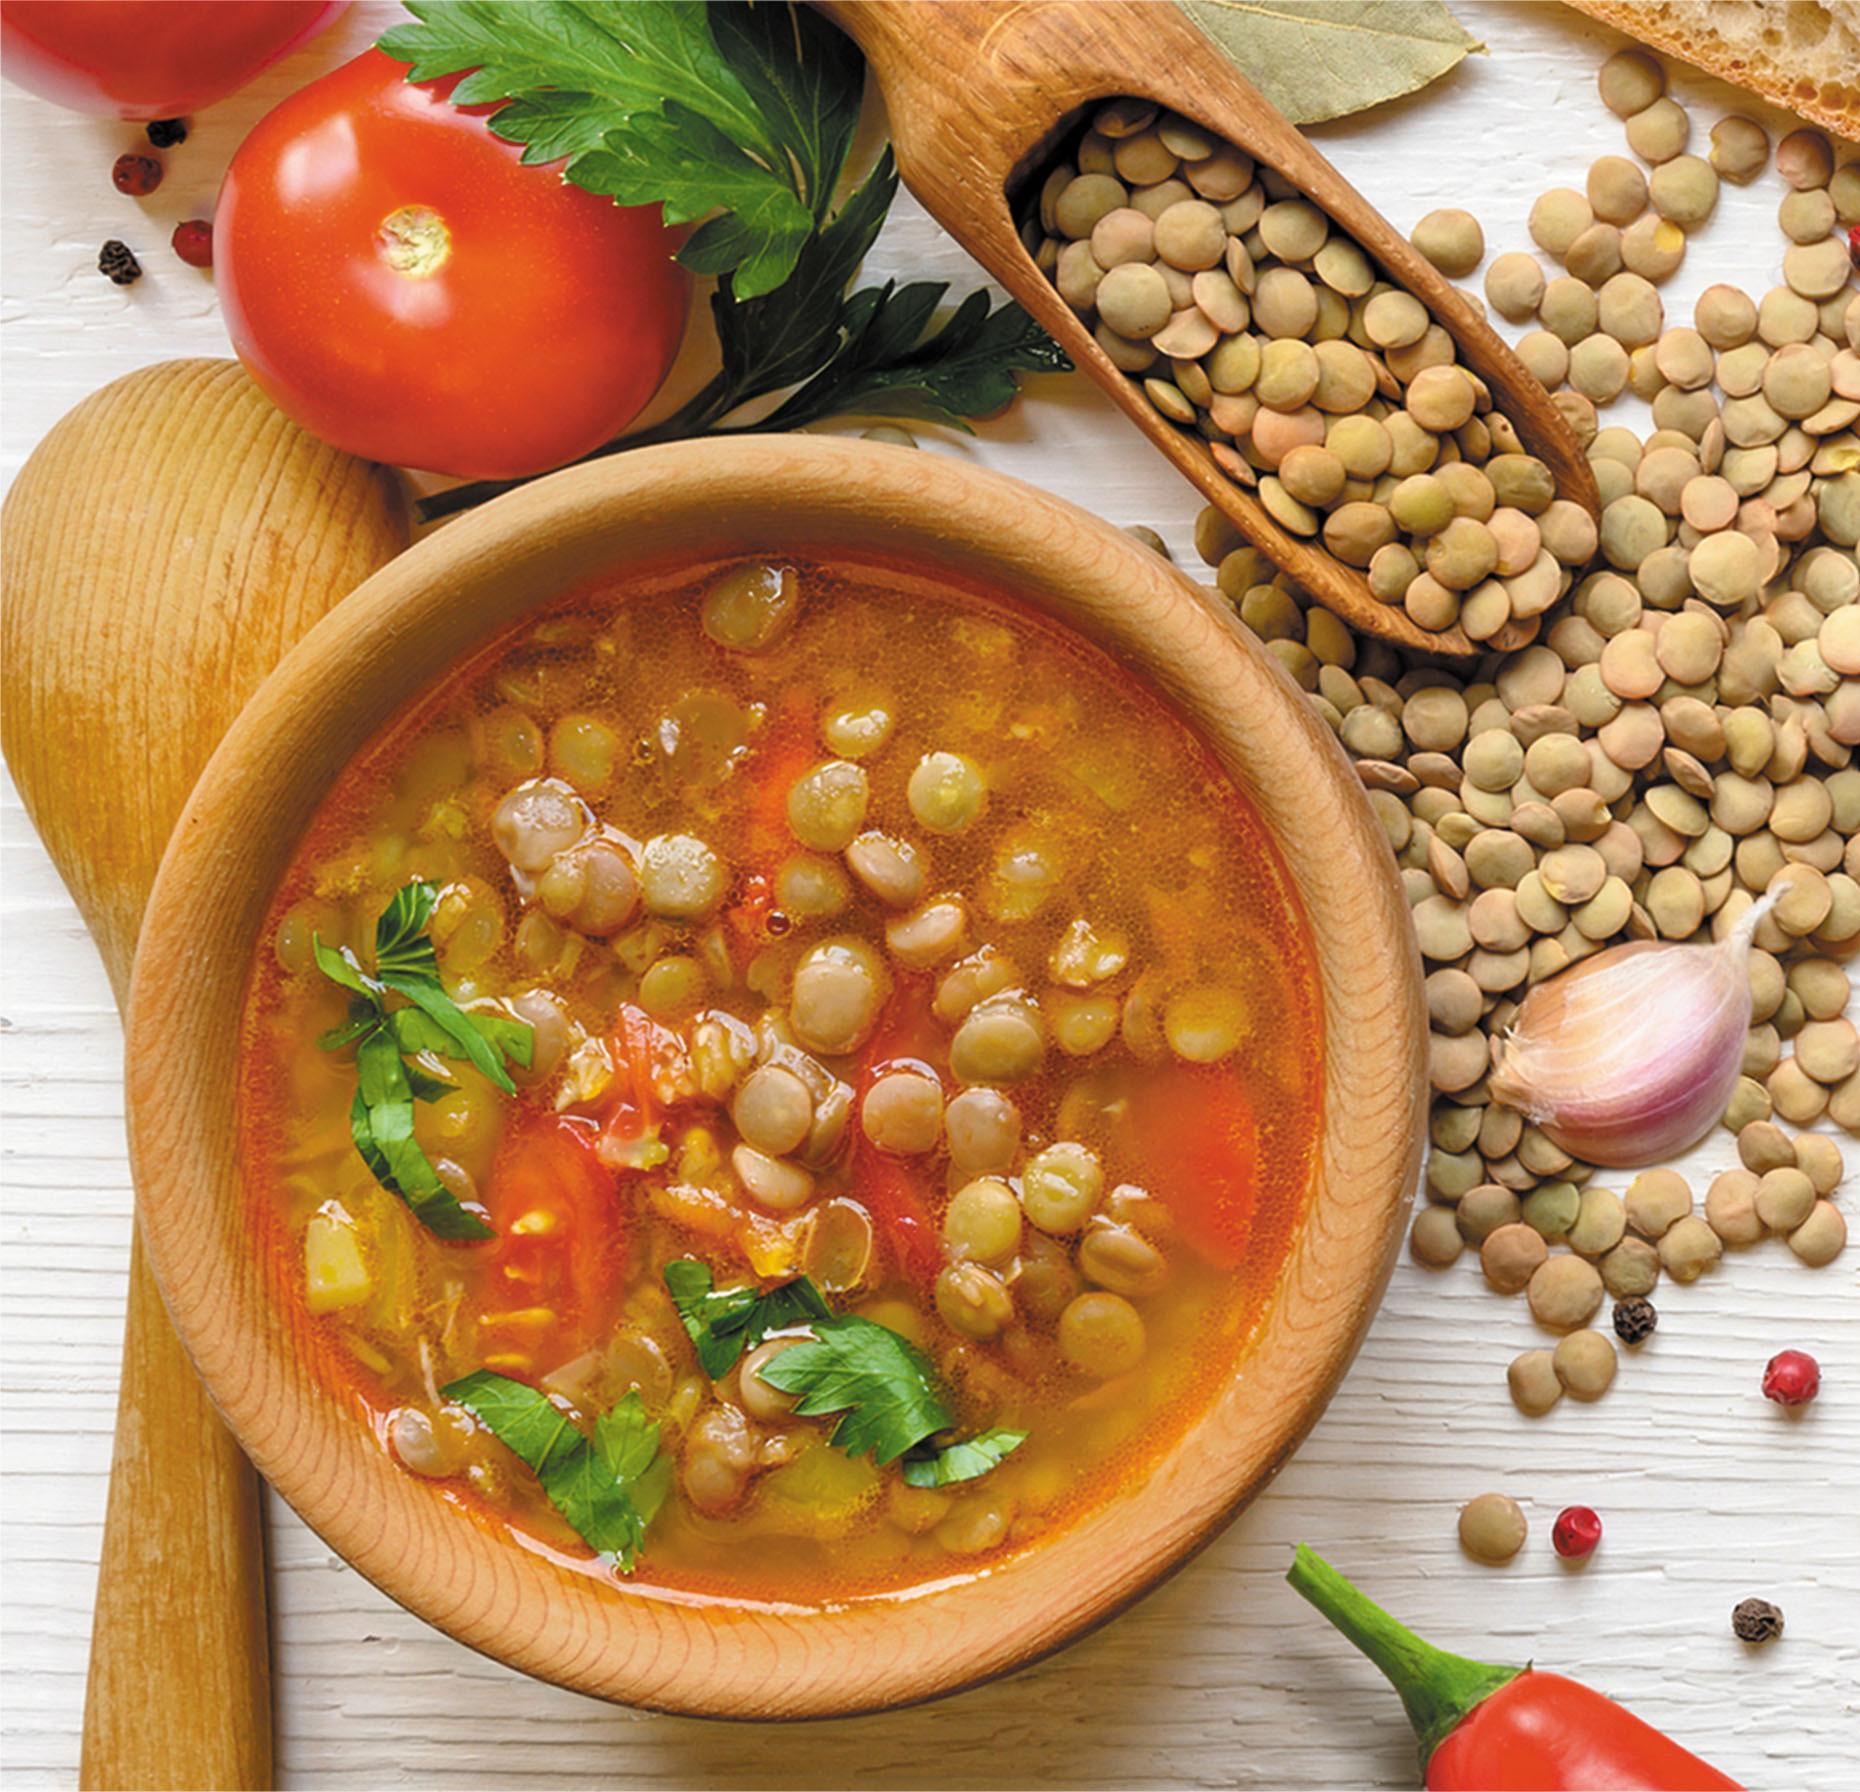 10 Healthy Diet Staples For Your Emergency Food Kit Harvard Health